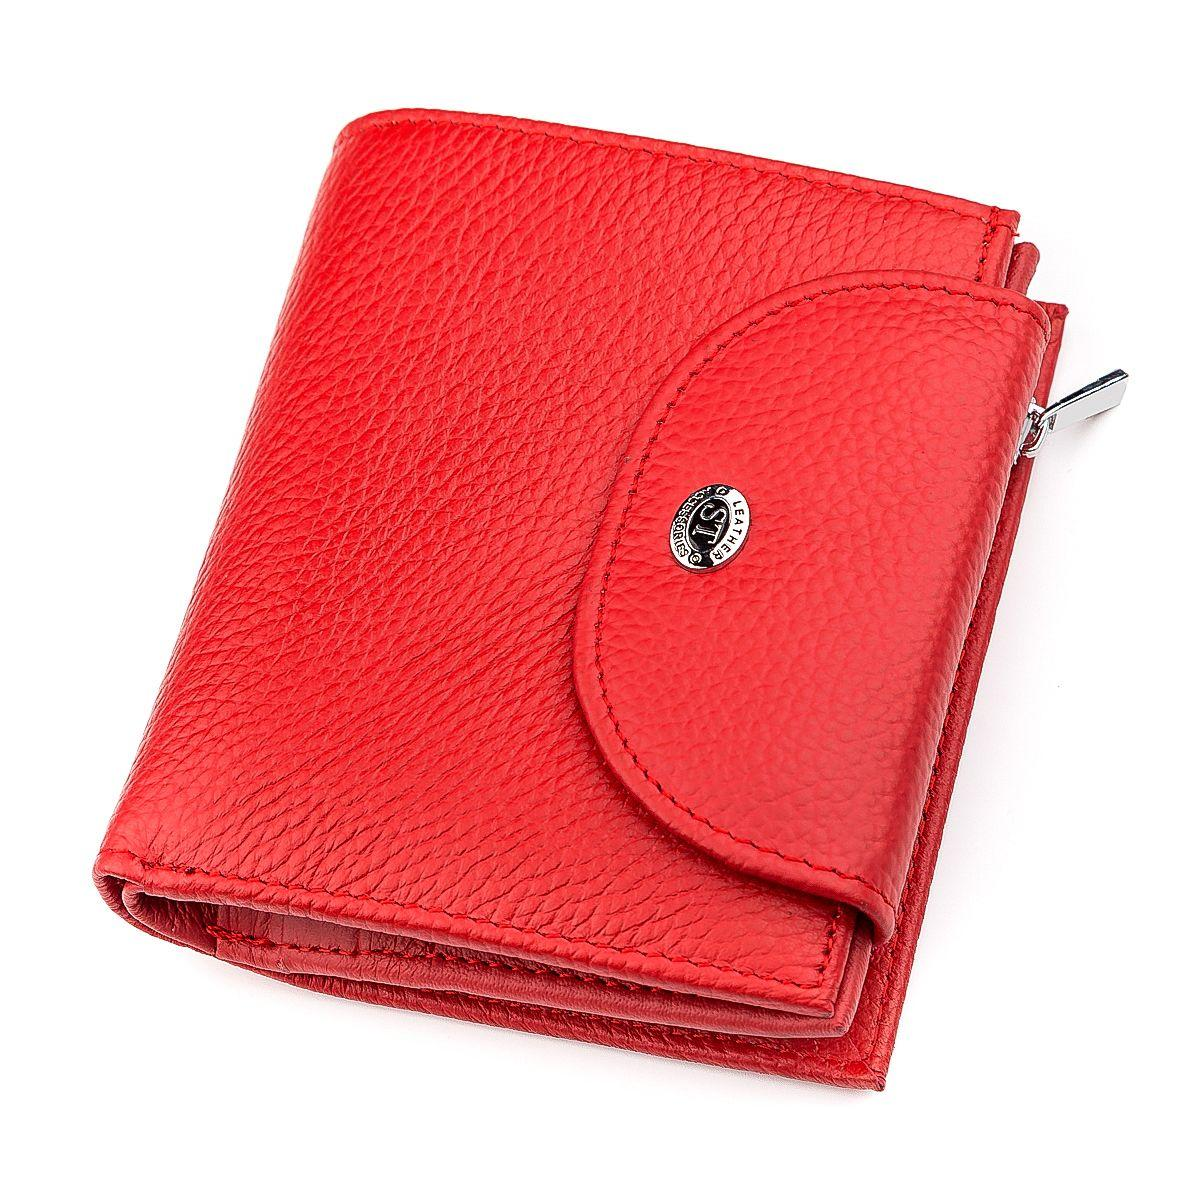 Кошелек женский ST Leather 18410 (ST410) кожаный Красный